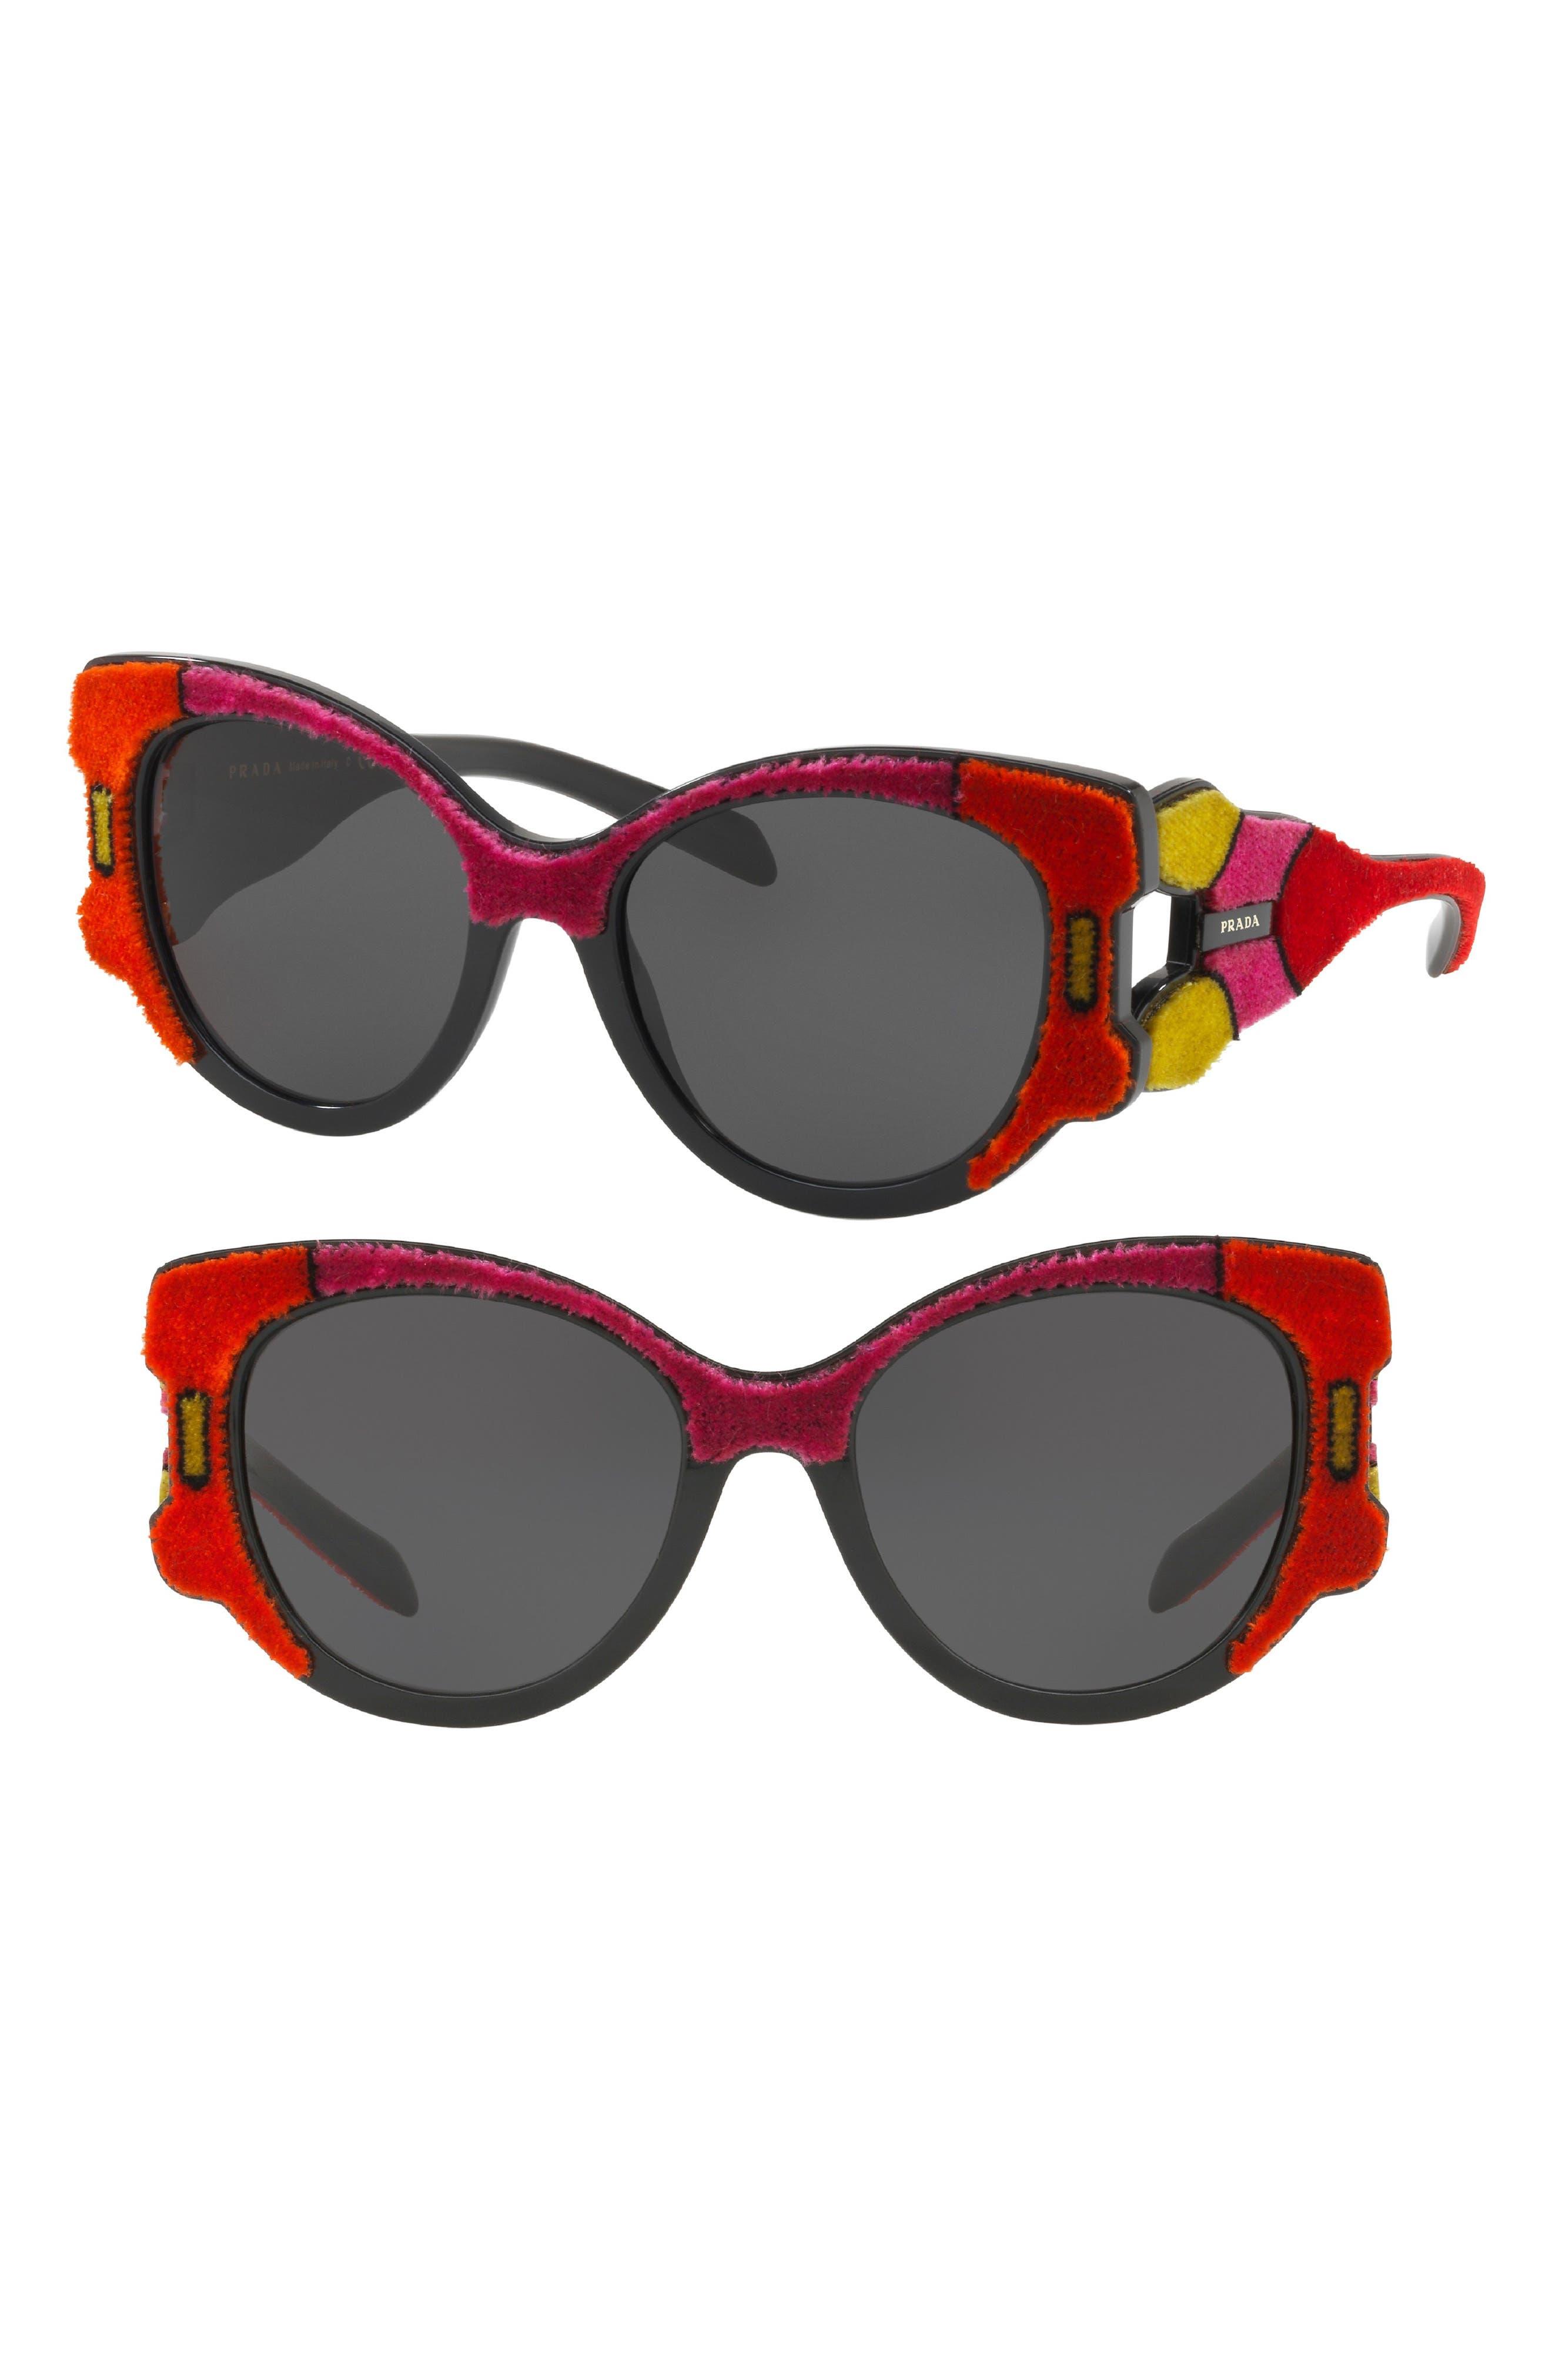 Main Image - Prada 54mm Colorblock Round Sunglasses